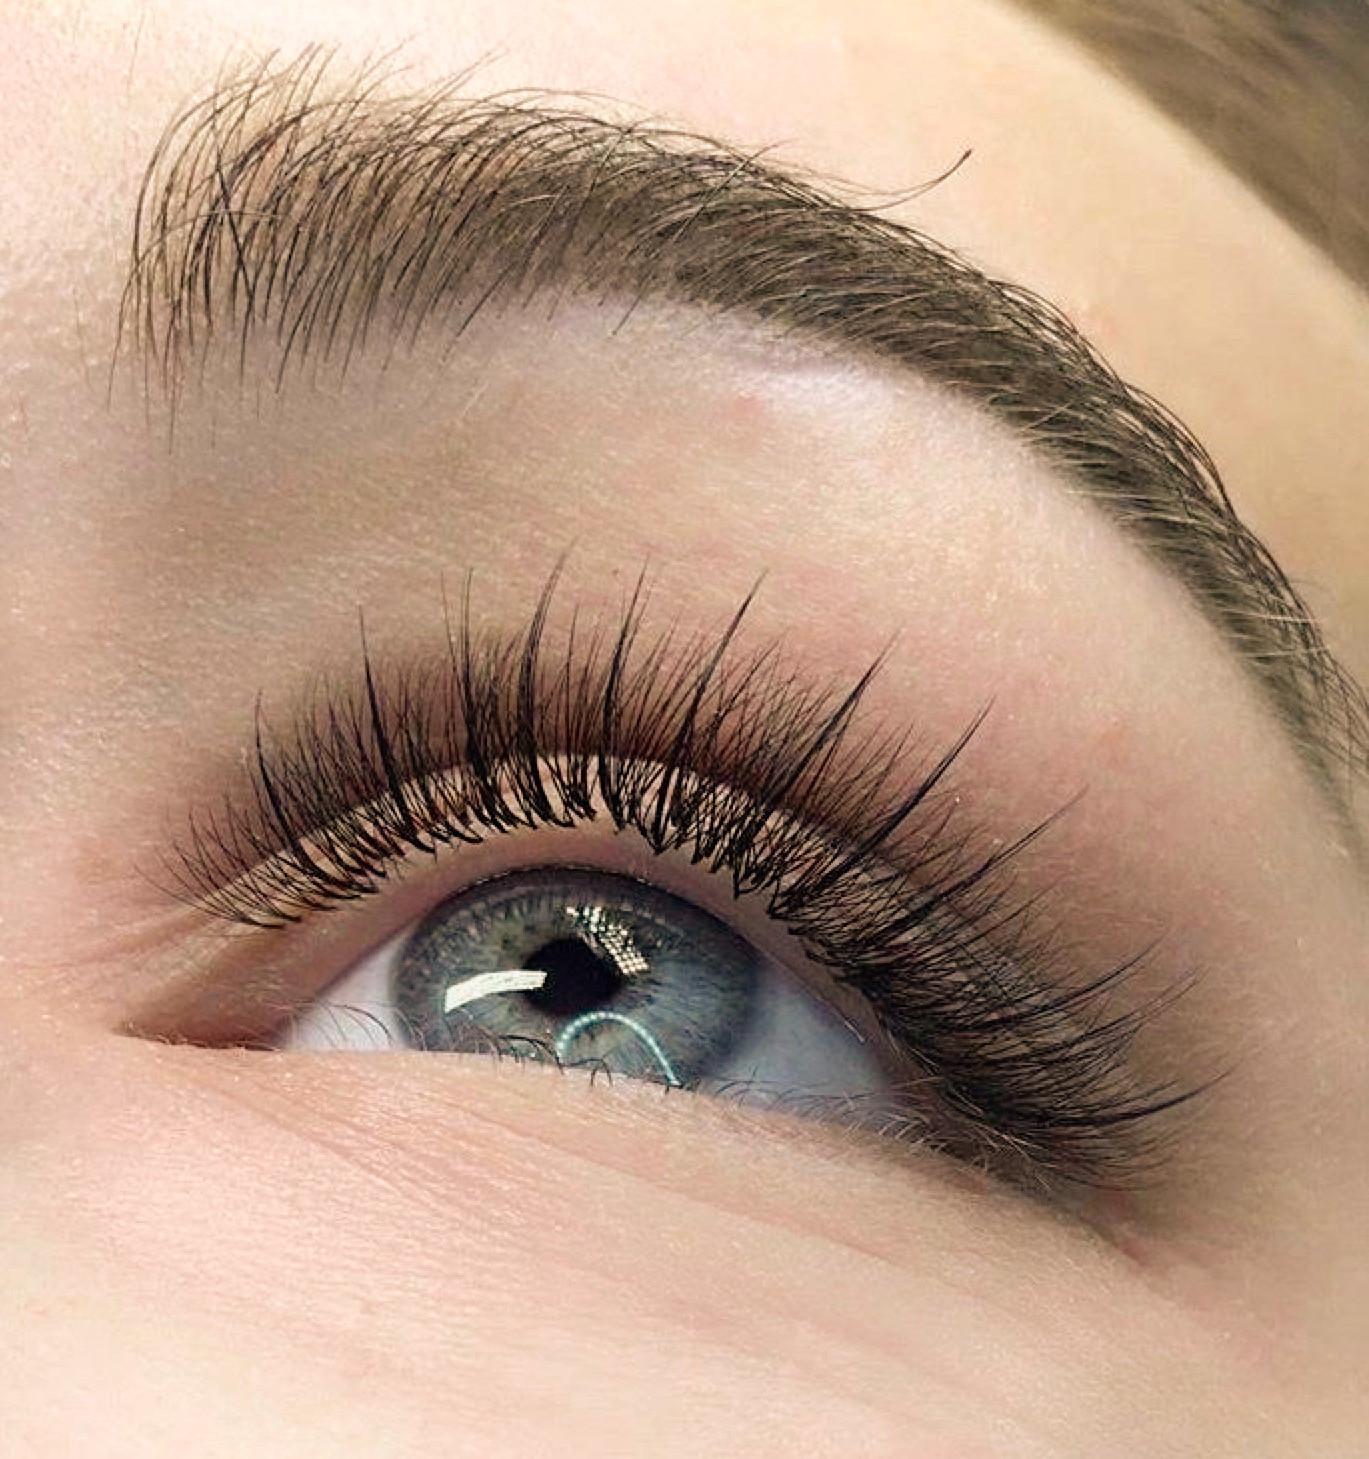 Classic Eyelash Extensions - Refill